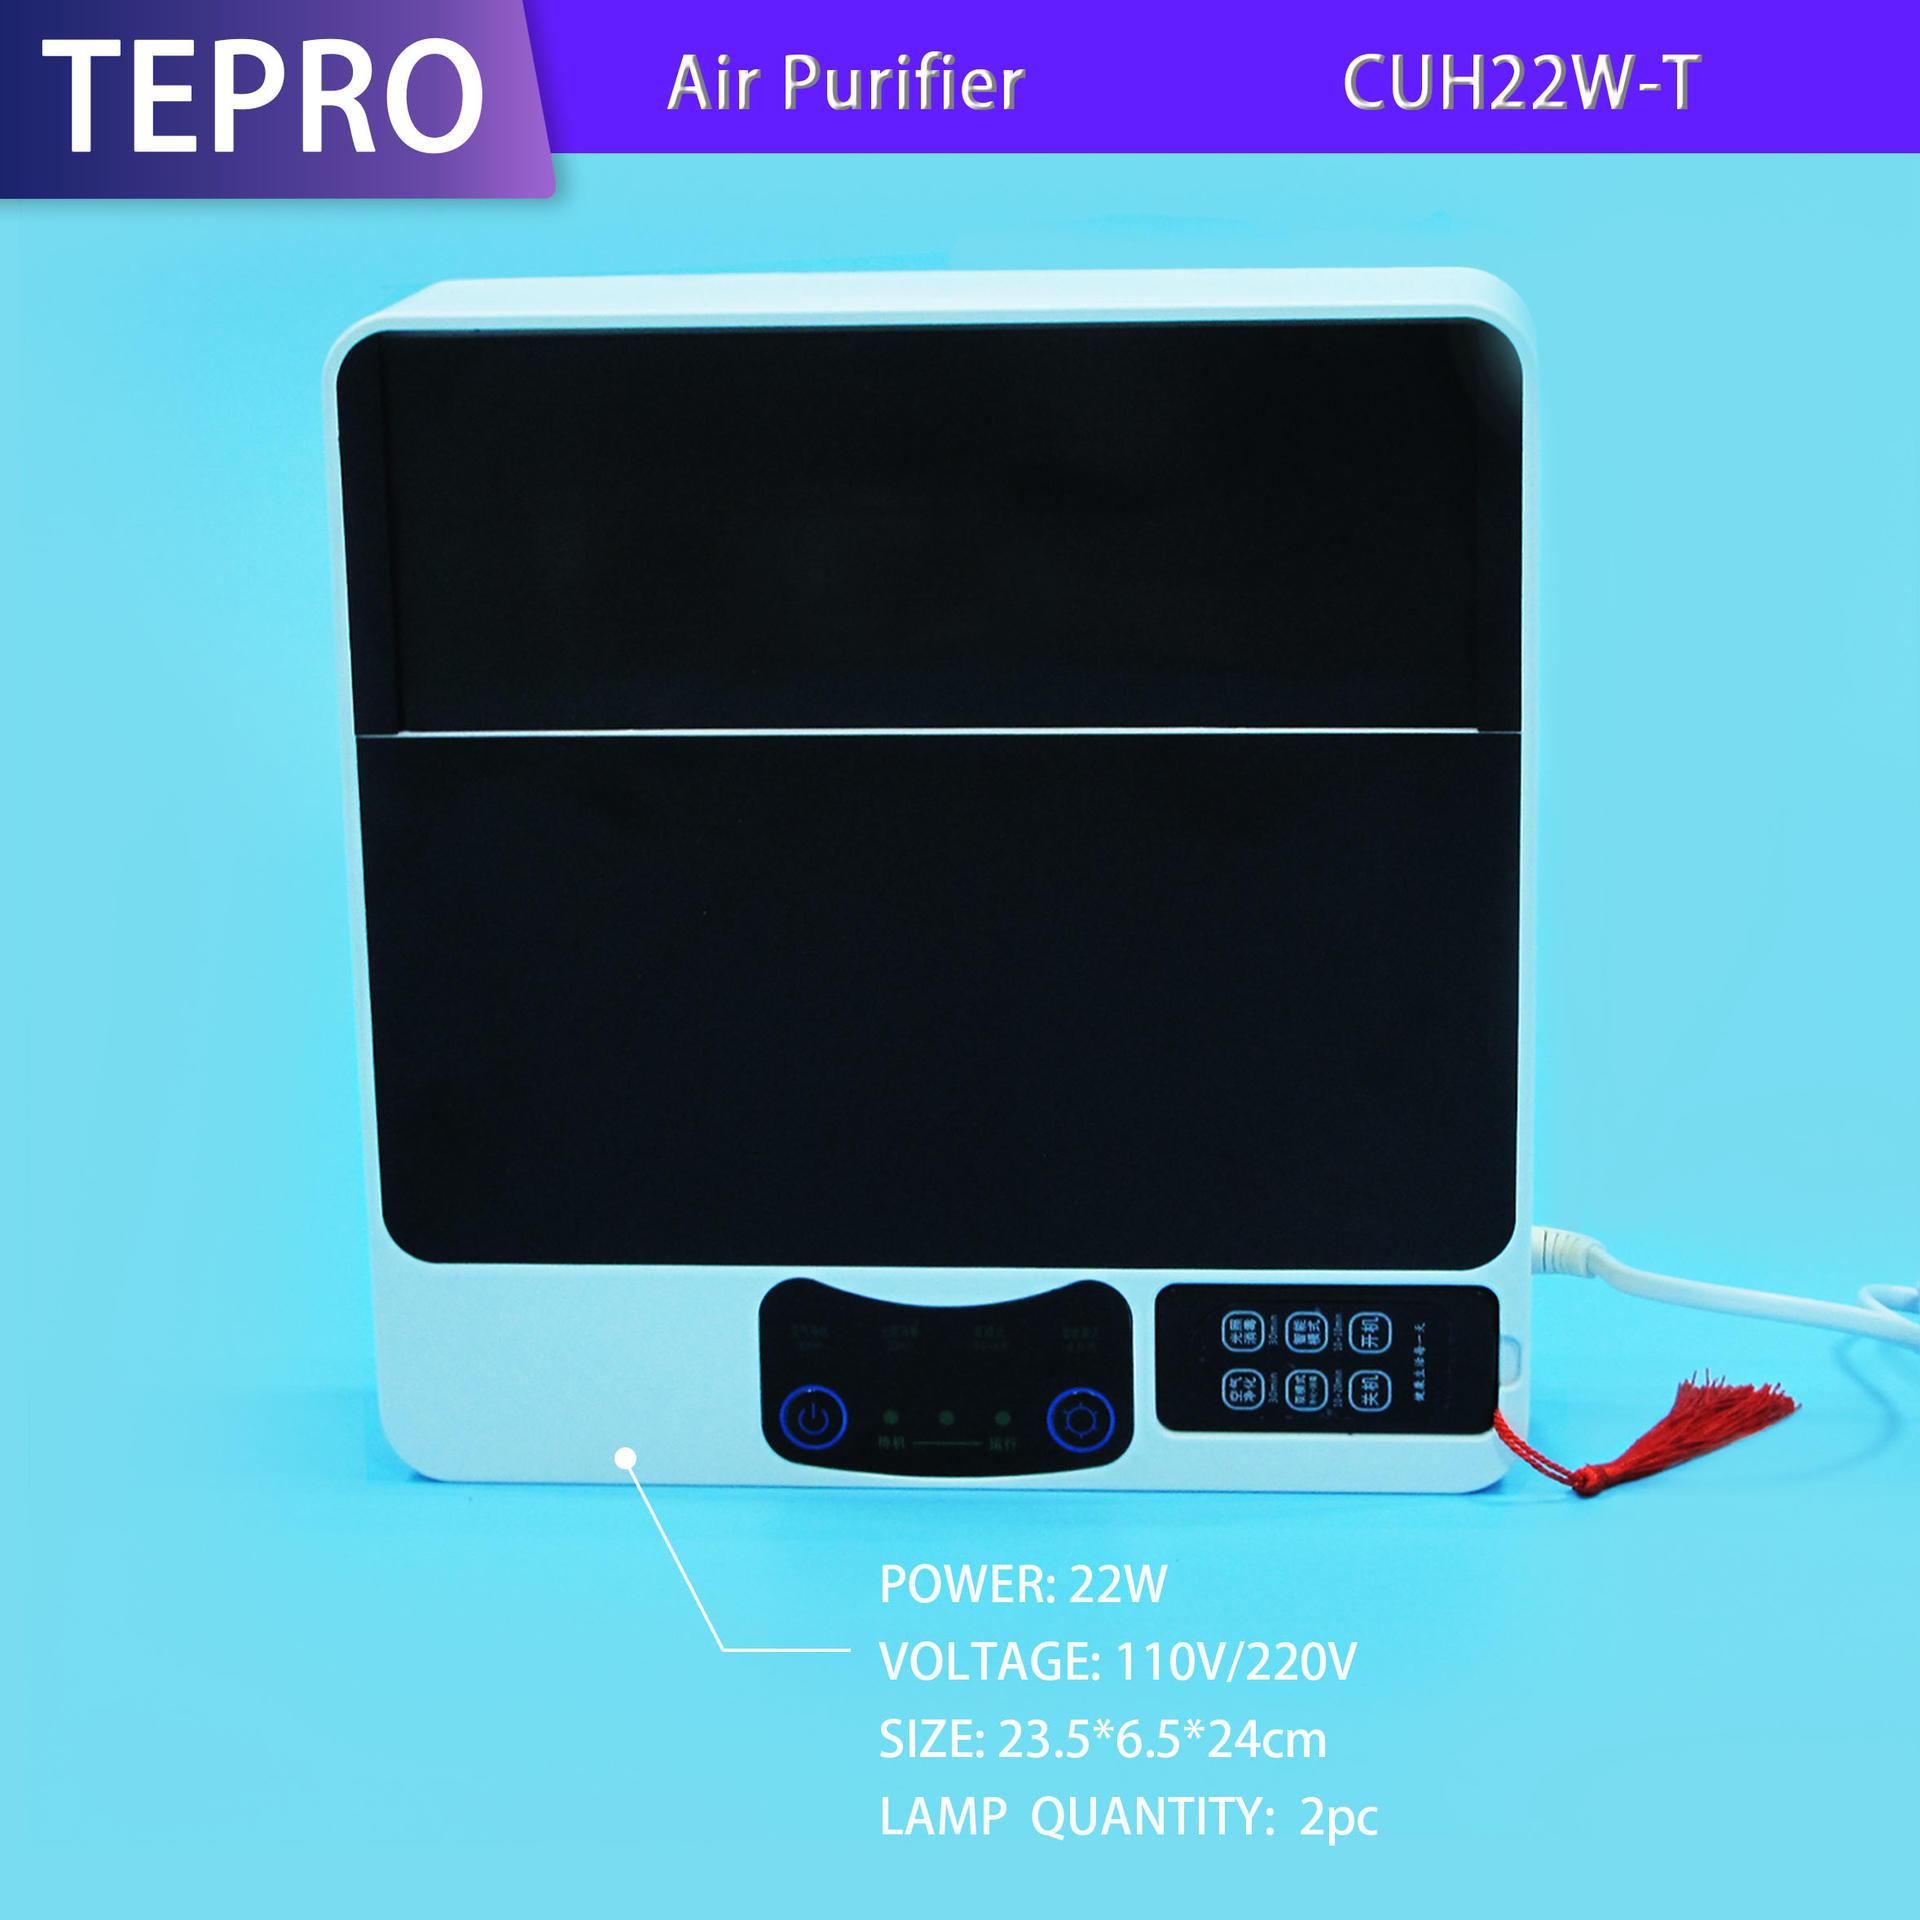 Professional Ozone Uv Air Purifier CUH22W-T